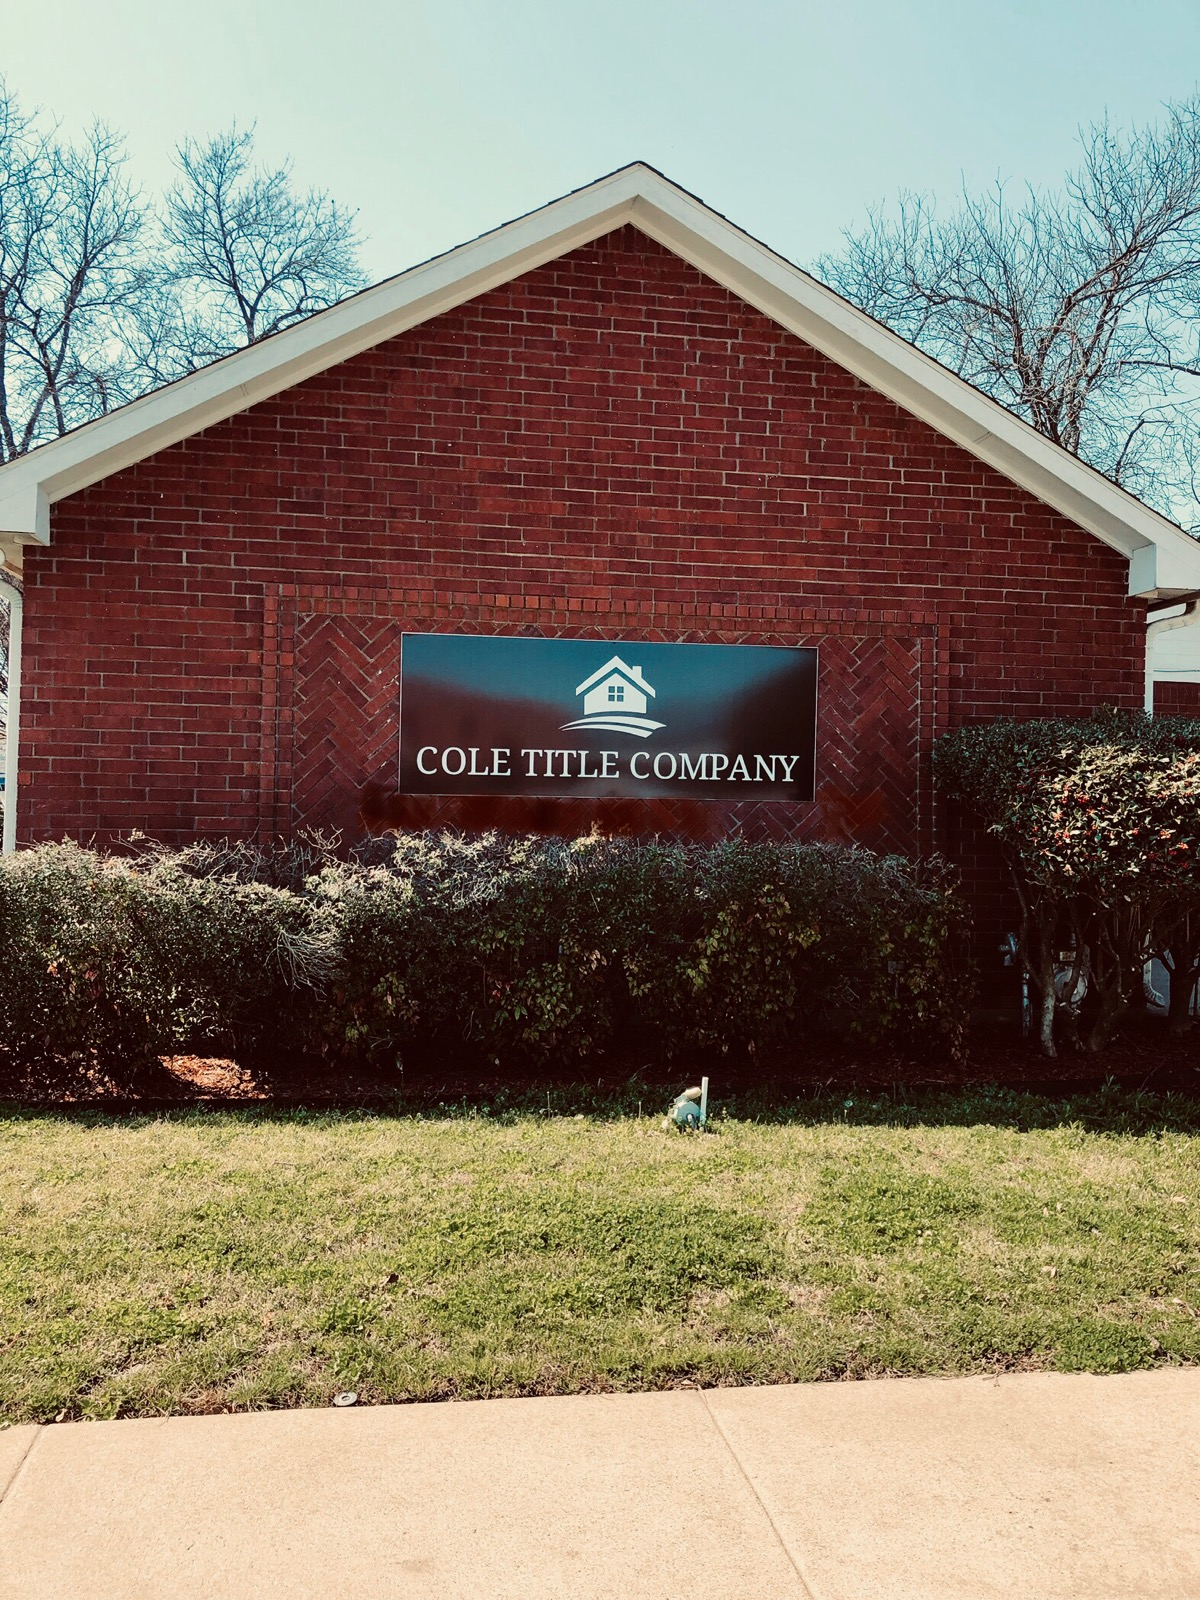 Cole title company building Bonham, Texas